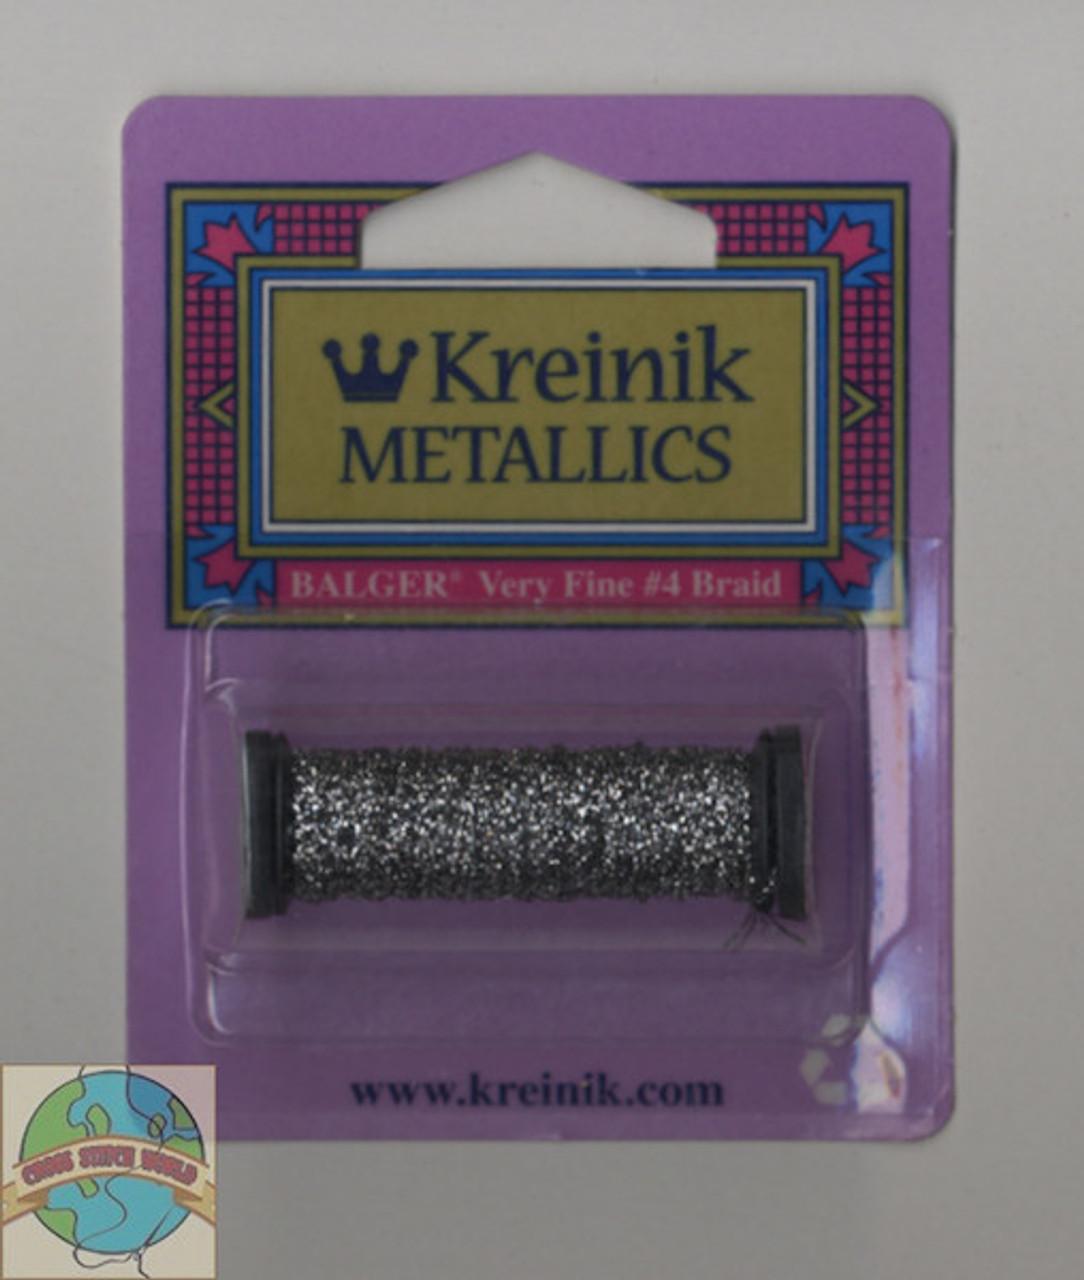 Kreinik Metallics - Very Fine #4 Pewter #019